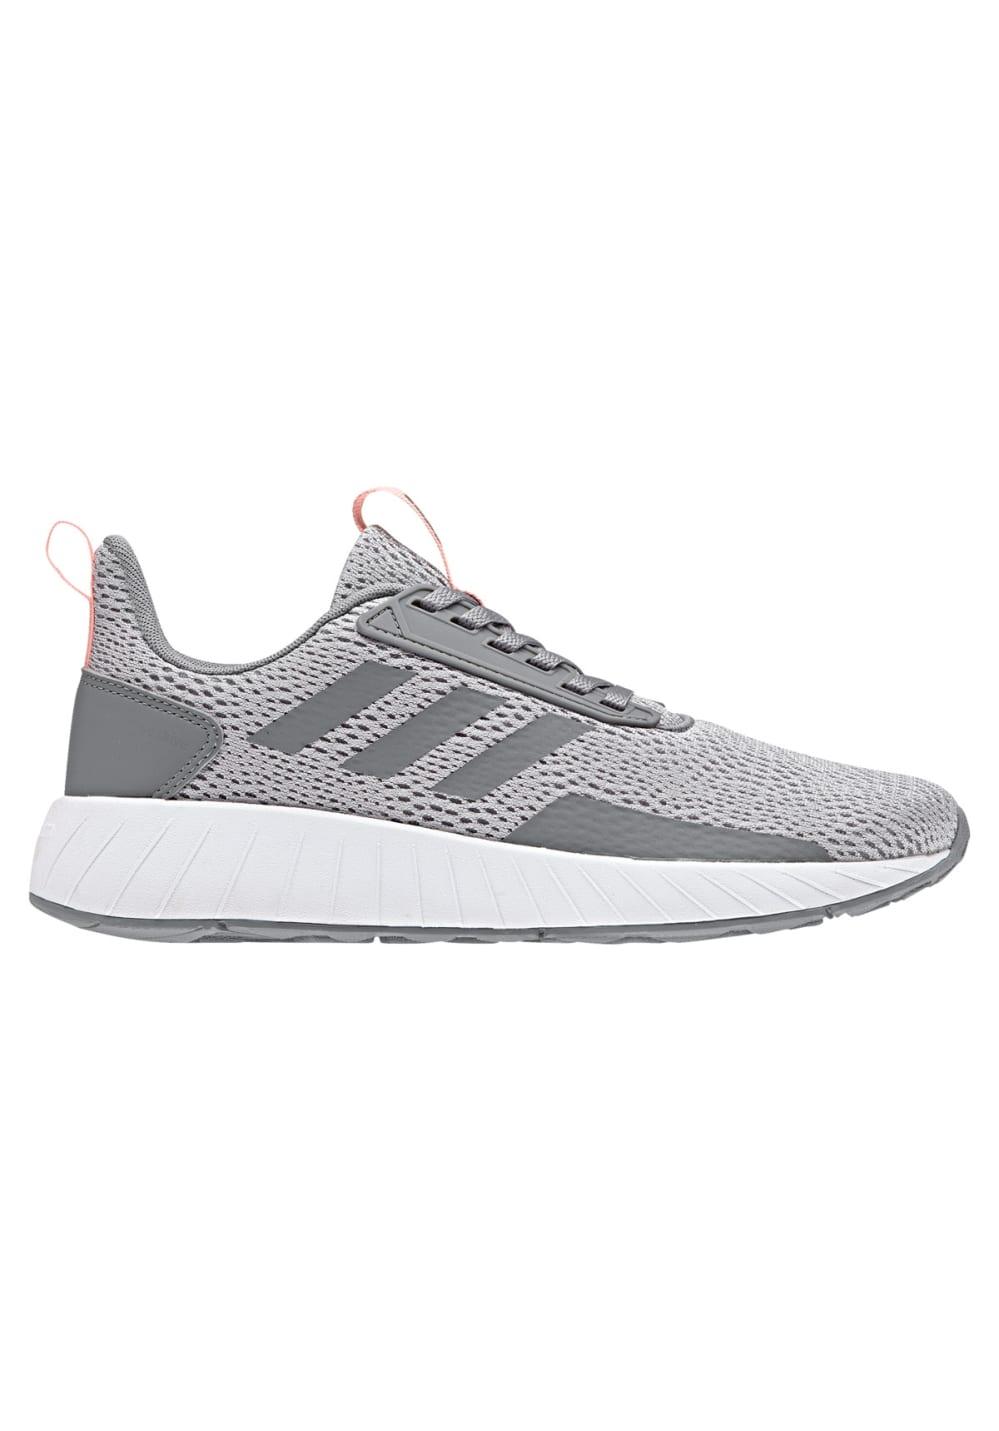 Pour Femme Questar Drive Running 21run Gris Chaussures Adidas zIq1q